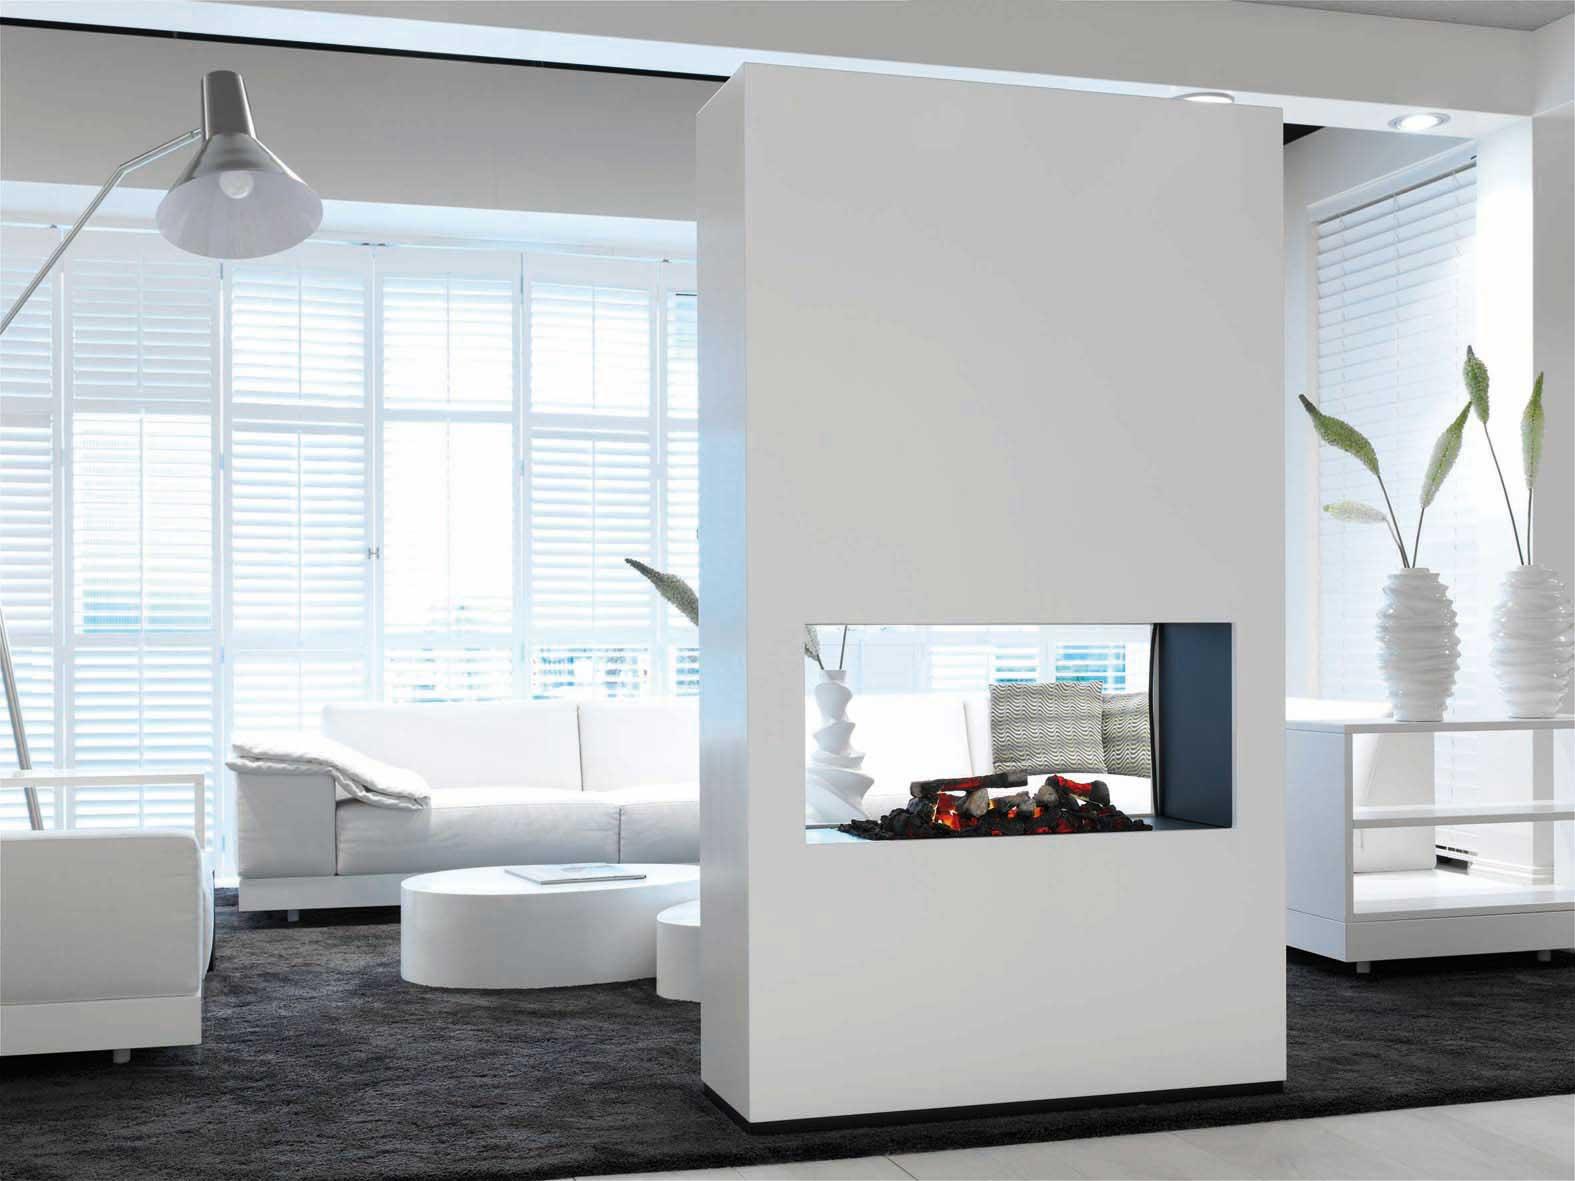 ruby fires bioethanol kamin ambiance kaufen im borono. Black Bedroom Furniture Sets. Home Design Ideas